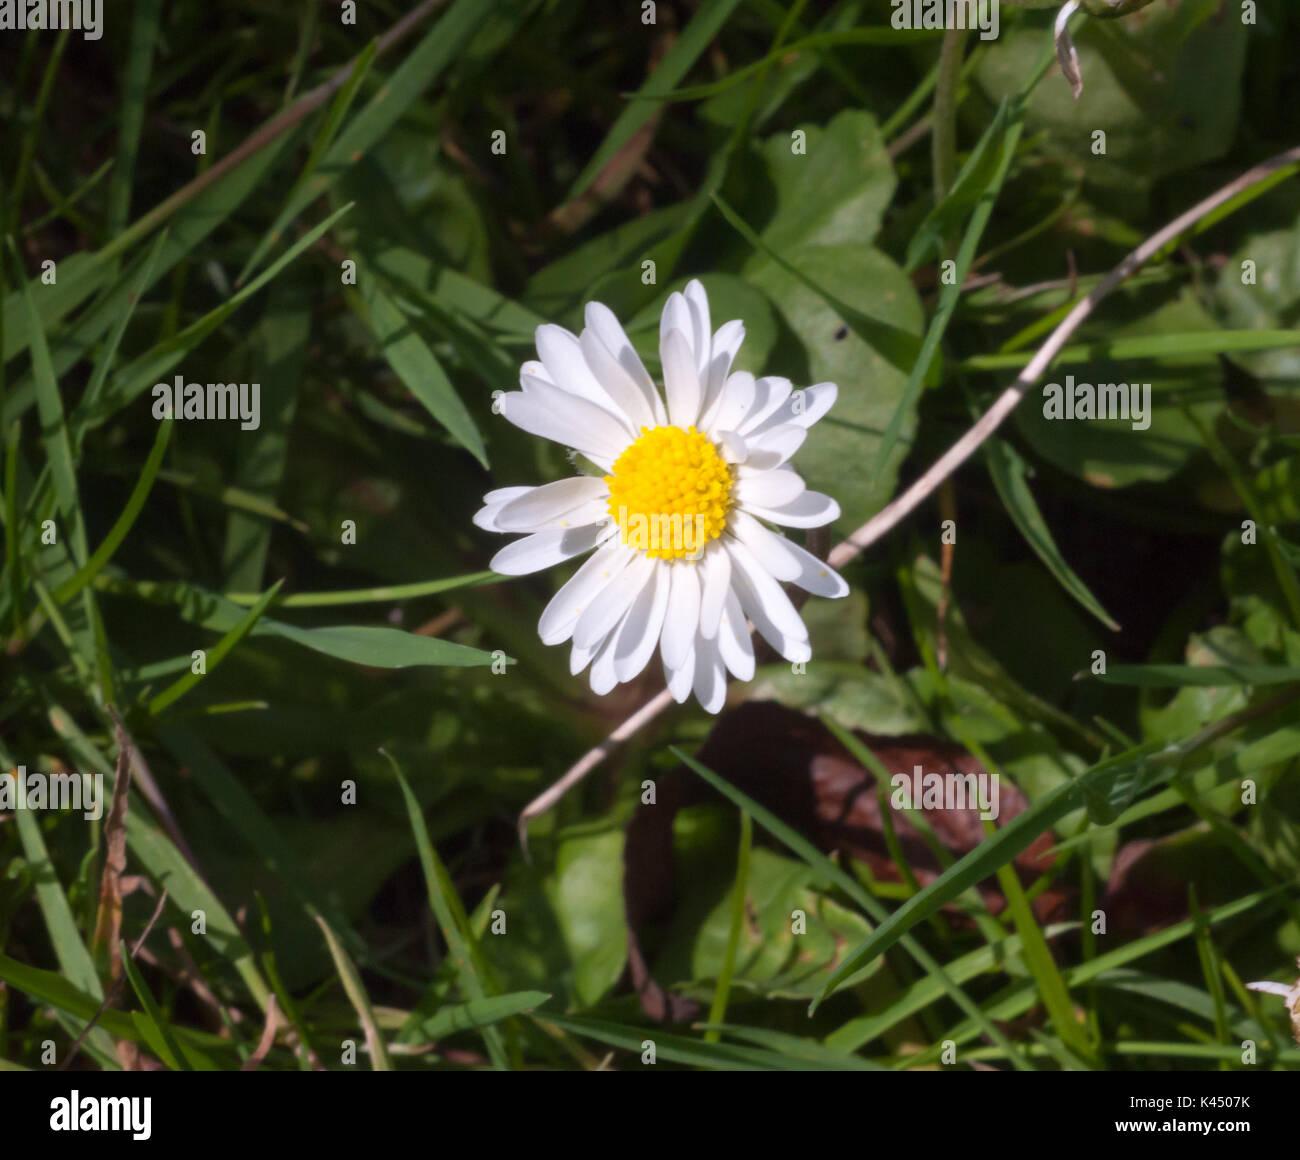 Daisy flower england stock photos daisy flower england stock small full petals single yellow and white daisy flower on floor essex england izmirmasajfo